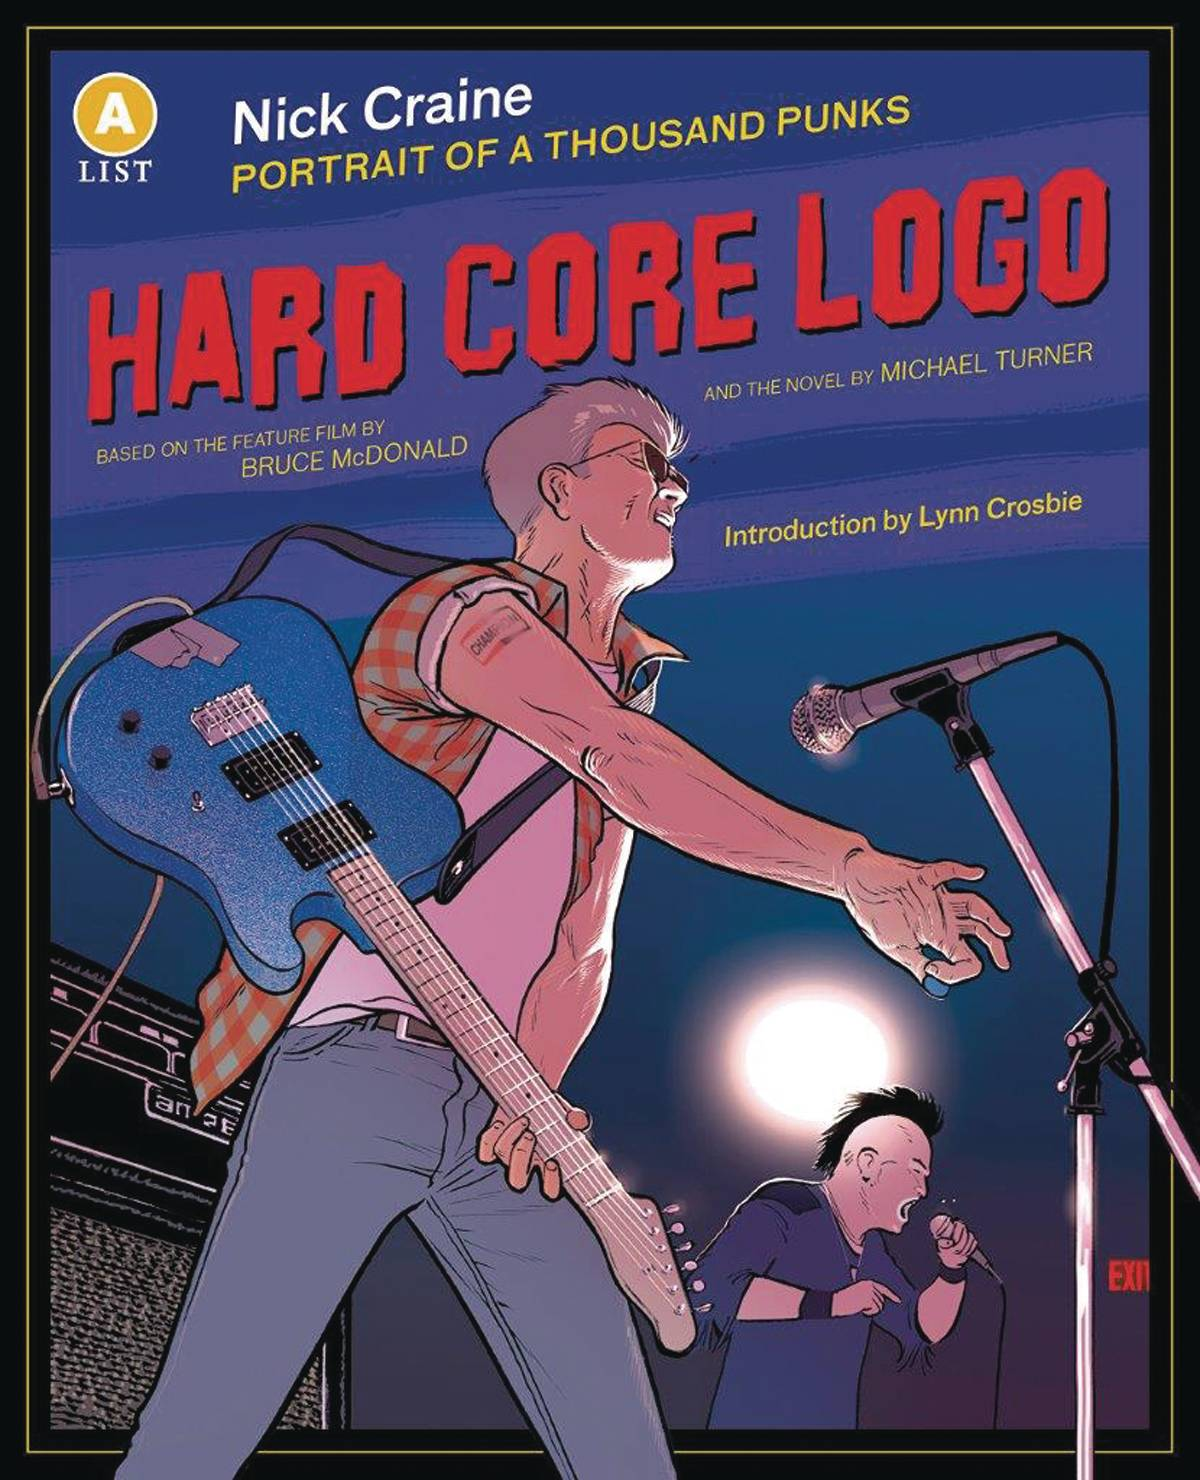 Hard Core Logo: Portrait of a Thousand Punks